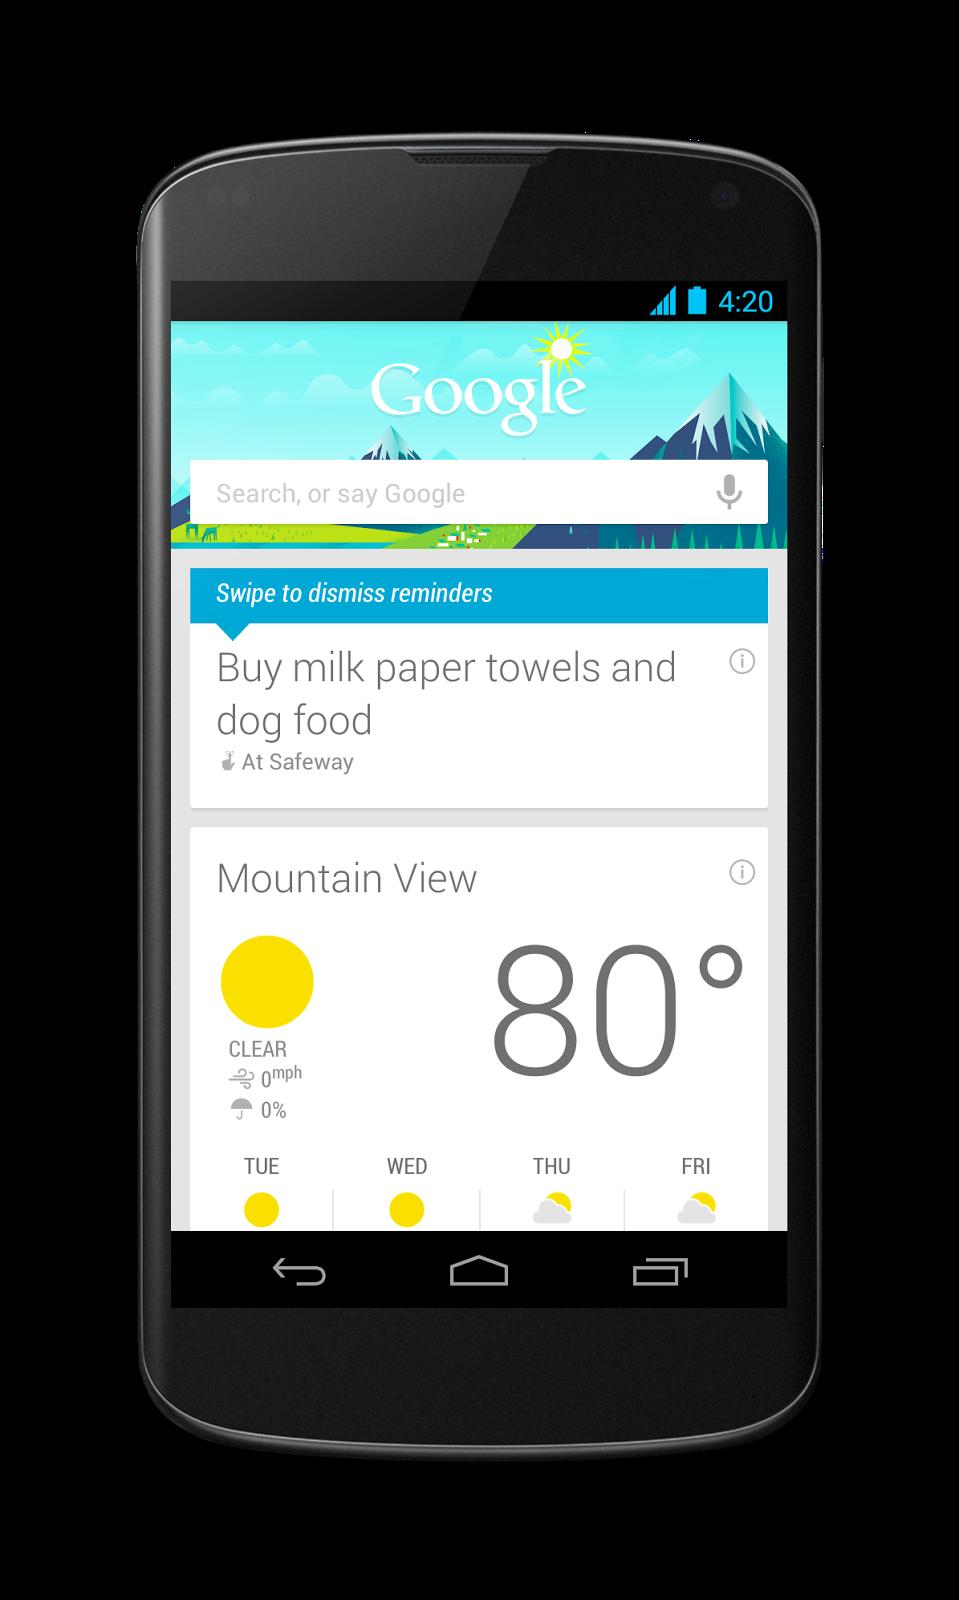 Google does it all. Google voice, Say google, App